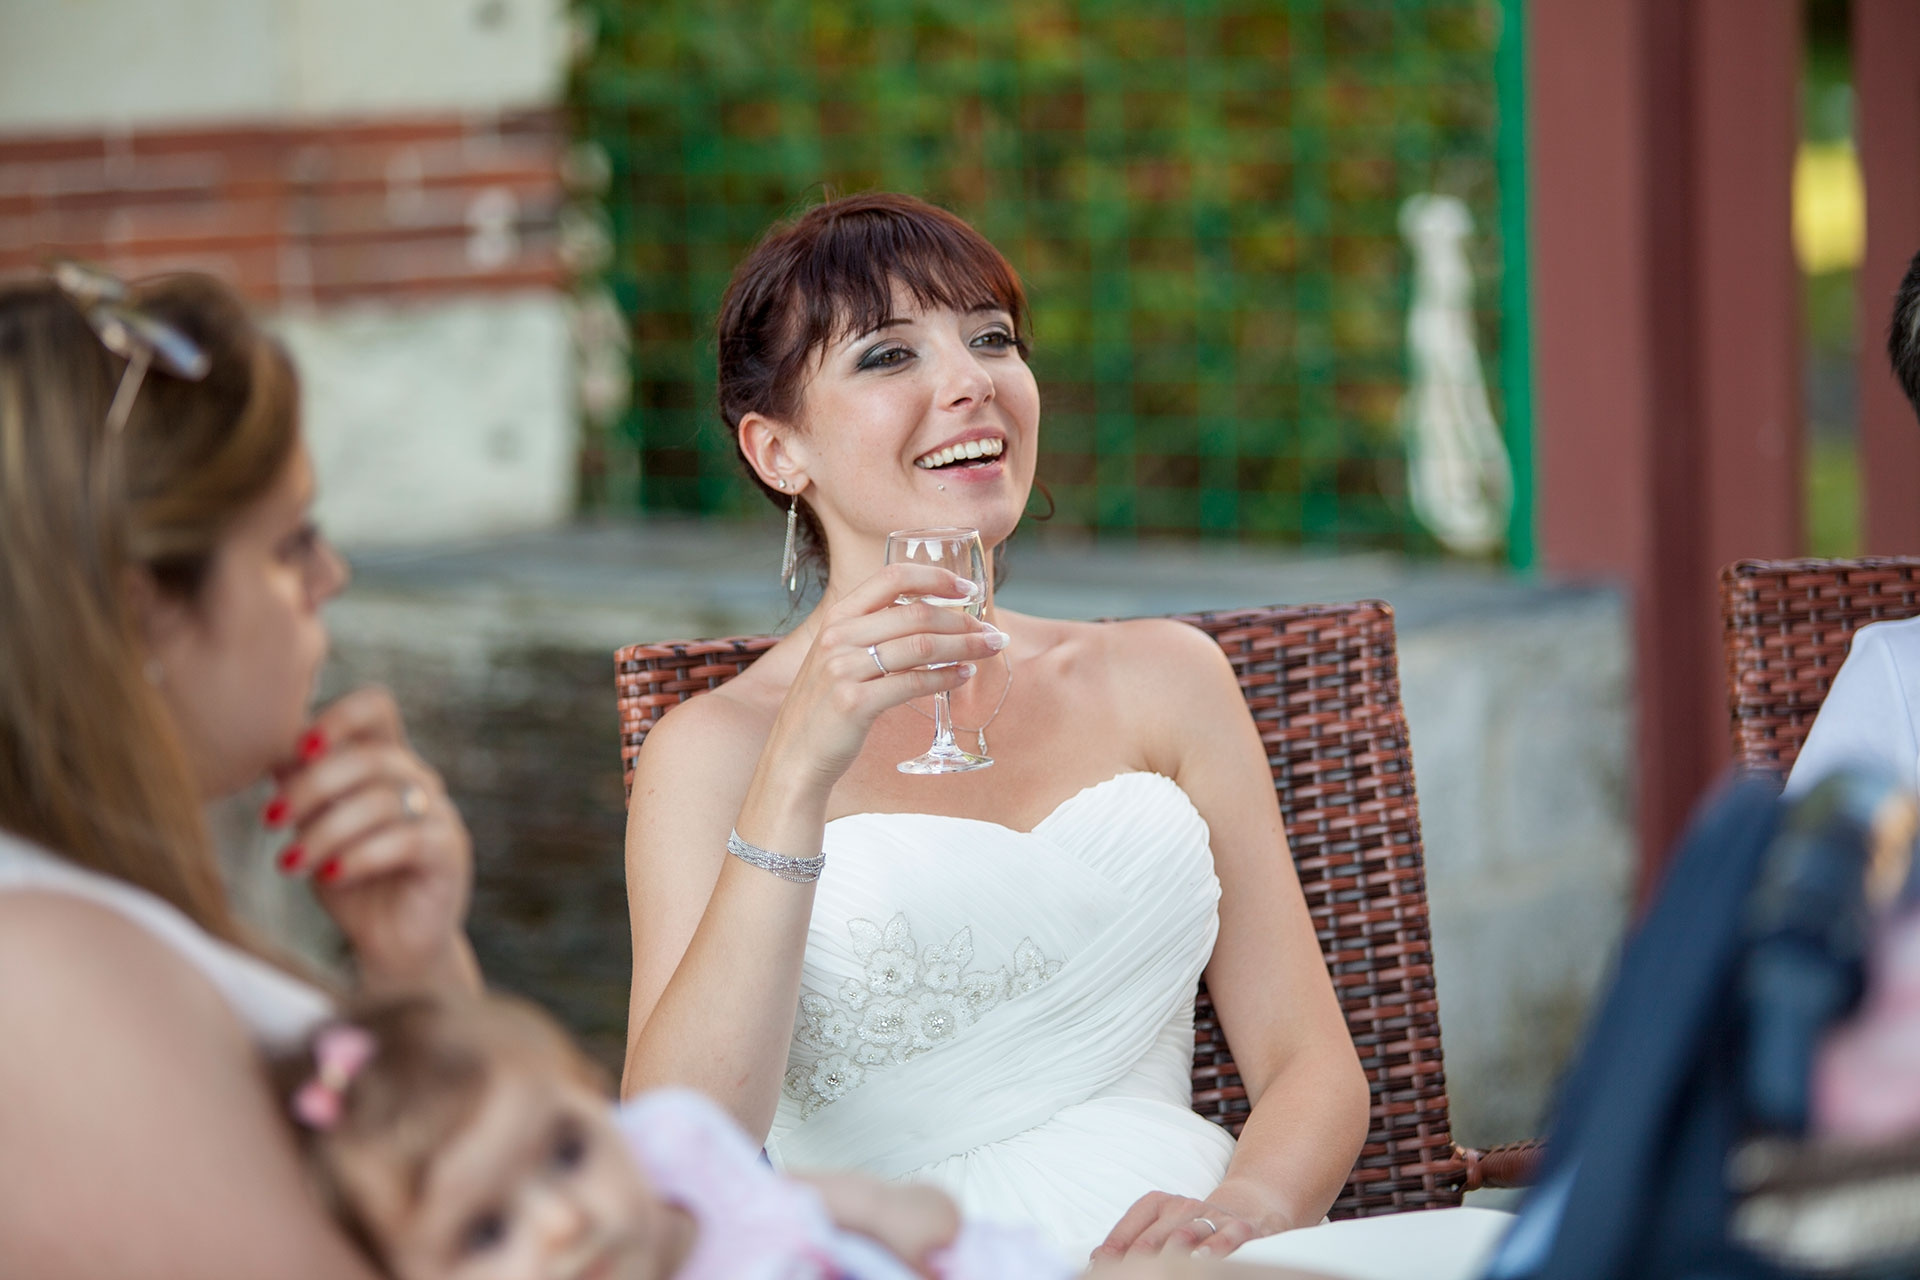 particuliers-evenements-mariages-oui-aurelie&geoffrey-44